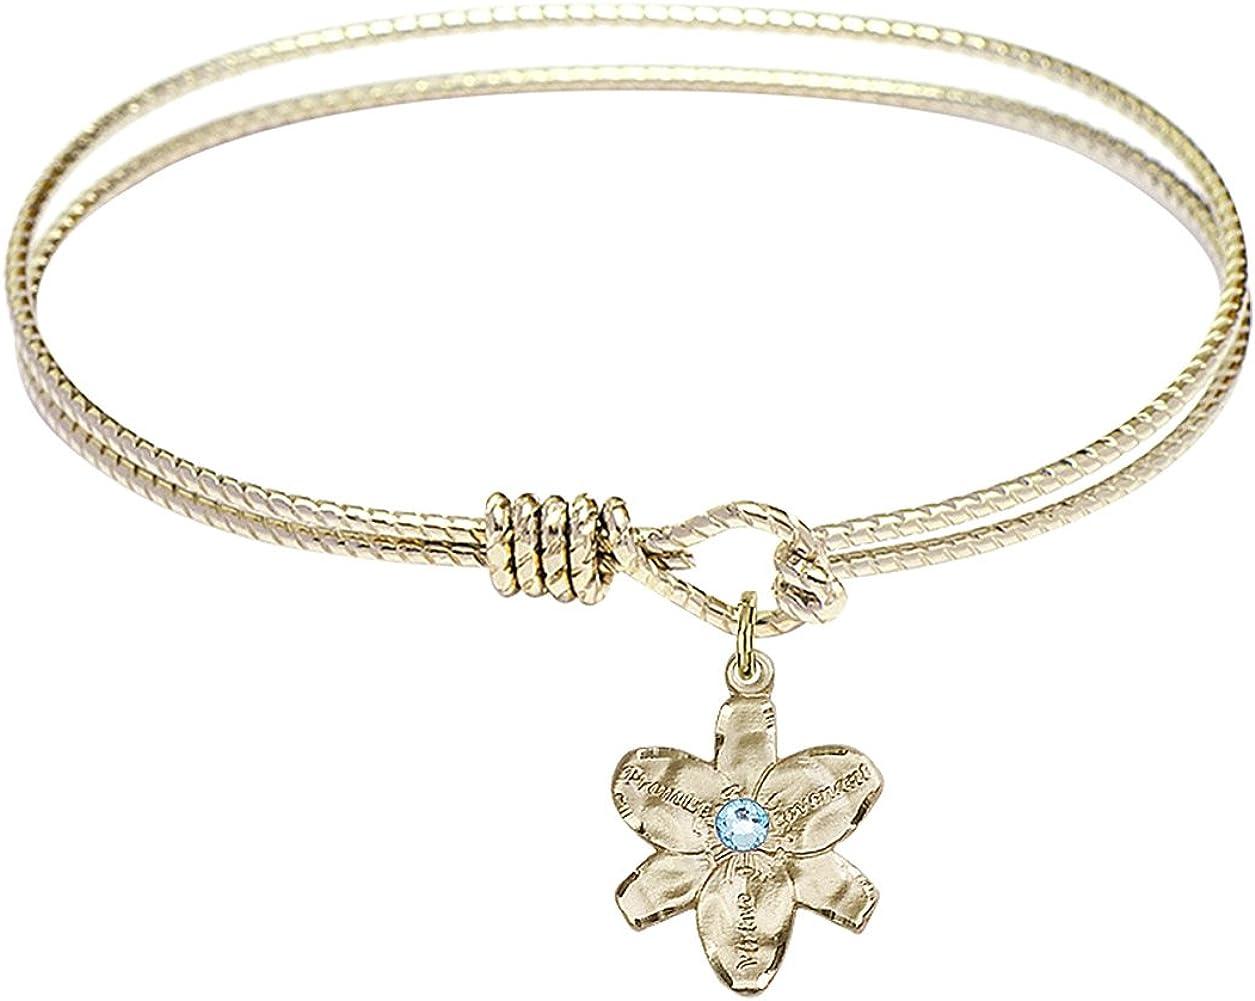 DiamondJewelryNY Max Al sold out. 52% OFF Eye Hook Bangle Bracelet Charm. a Chastity with